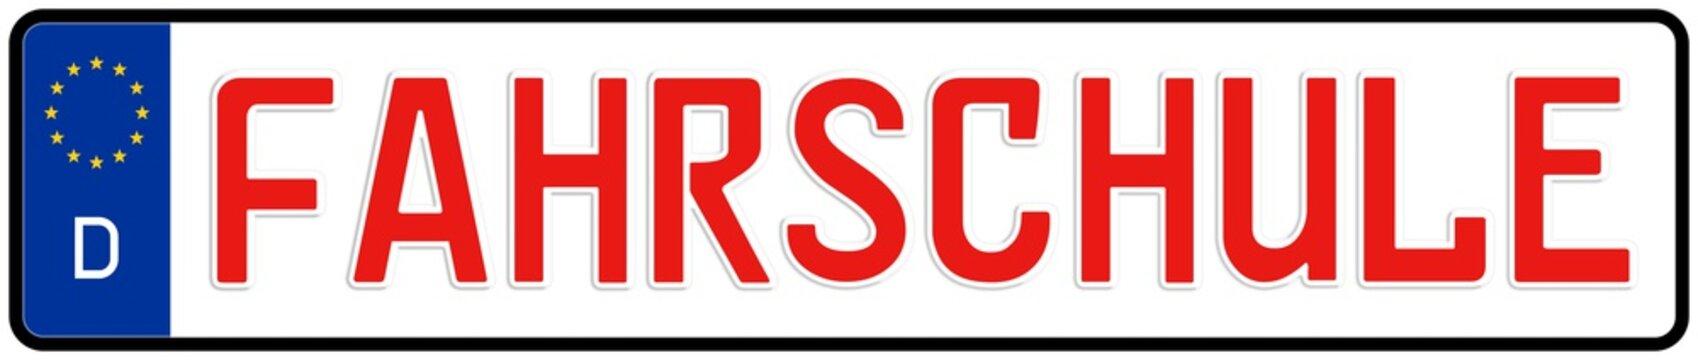 spkw41 SignPersonenKraftWagen spkw - Schrift: Fahrschule - Autokennzeichen / Nummernschild - (Original-Verhältnis 520 X 110 mm) - banner rot xxl g5917